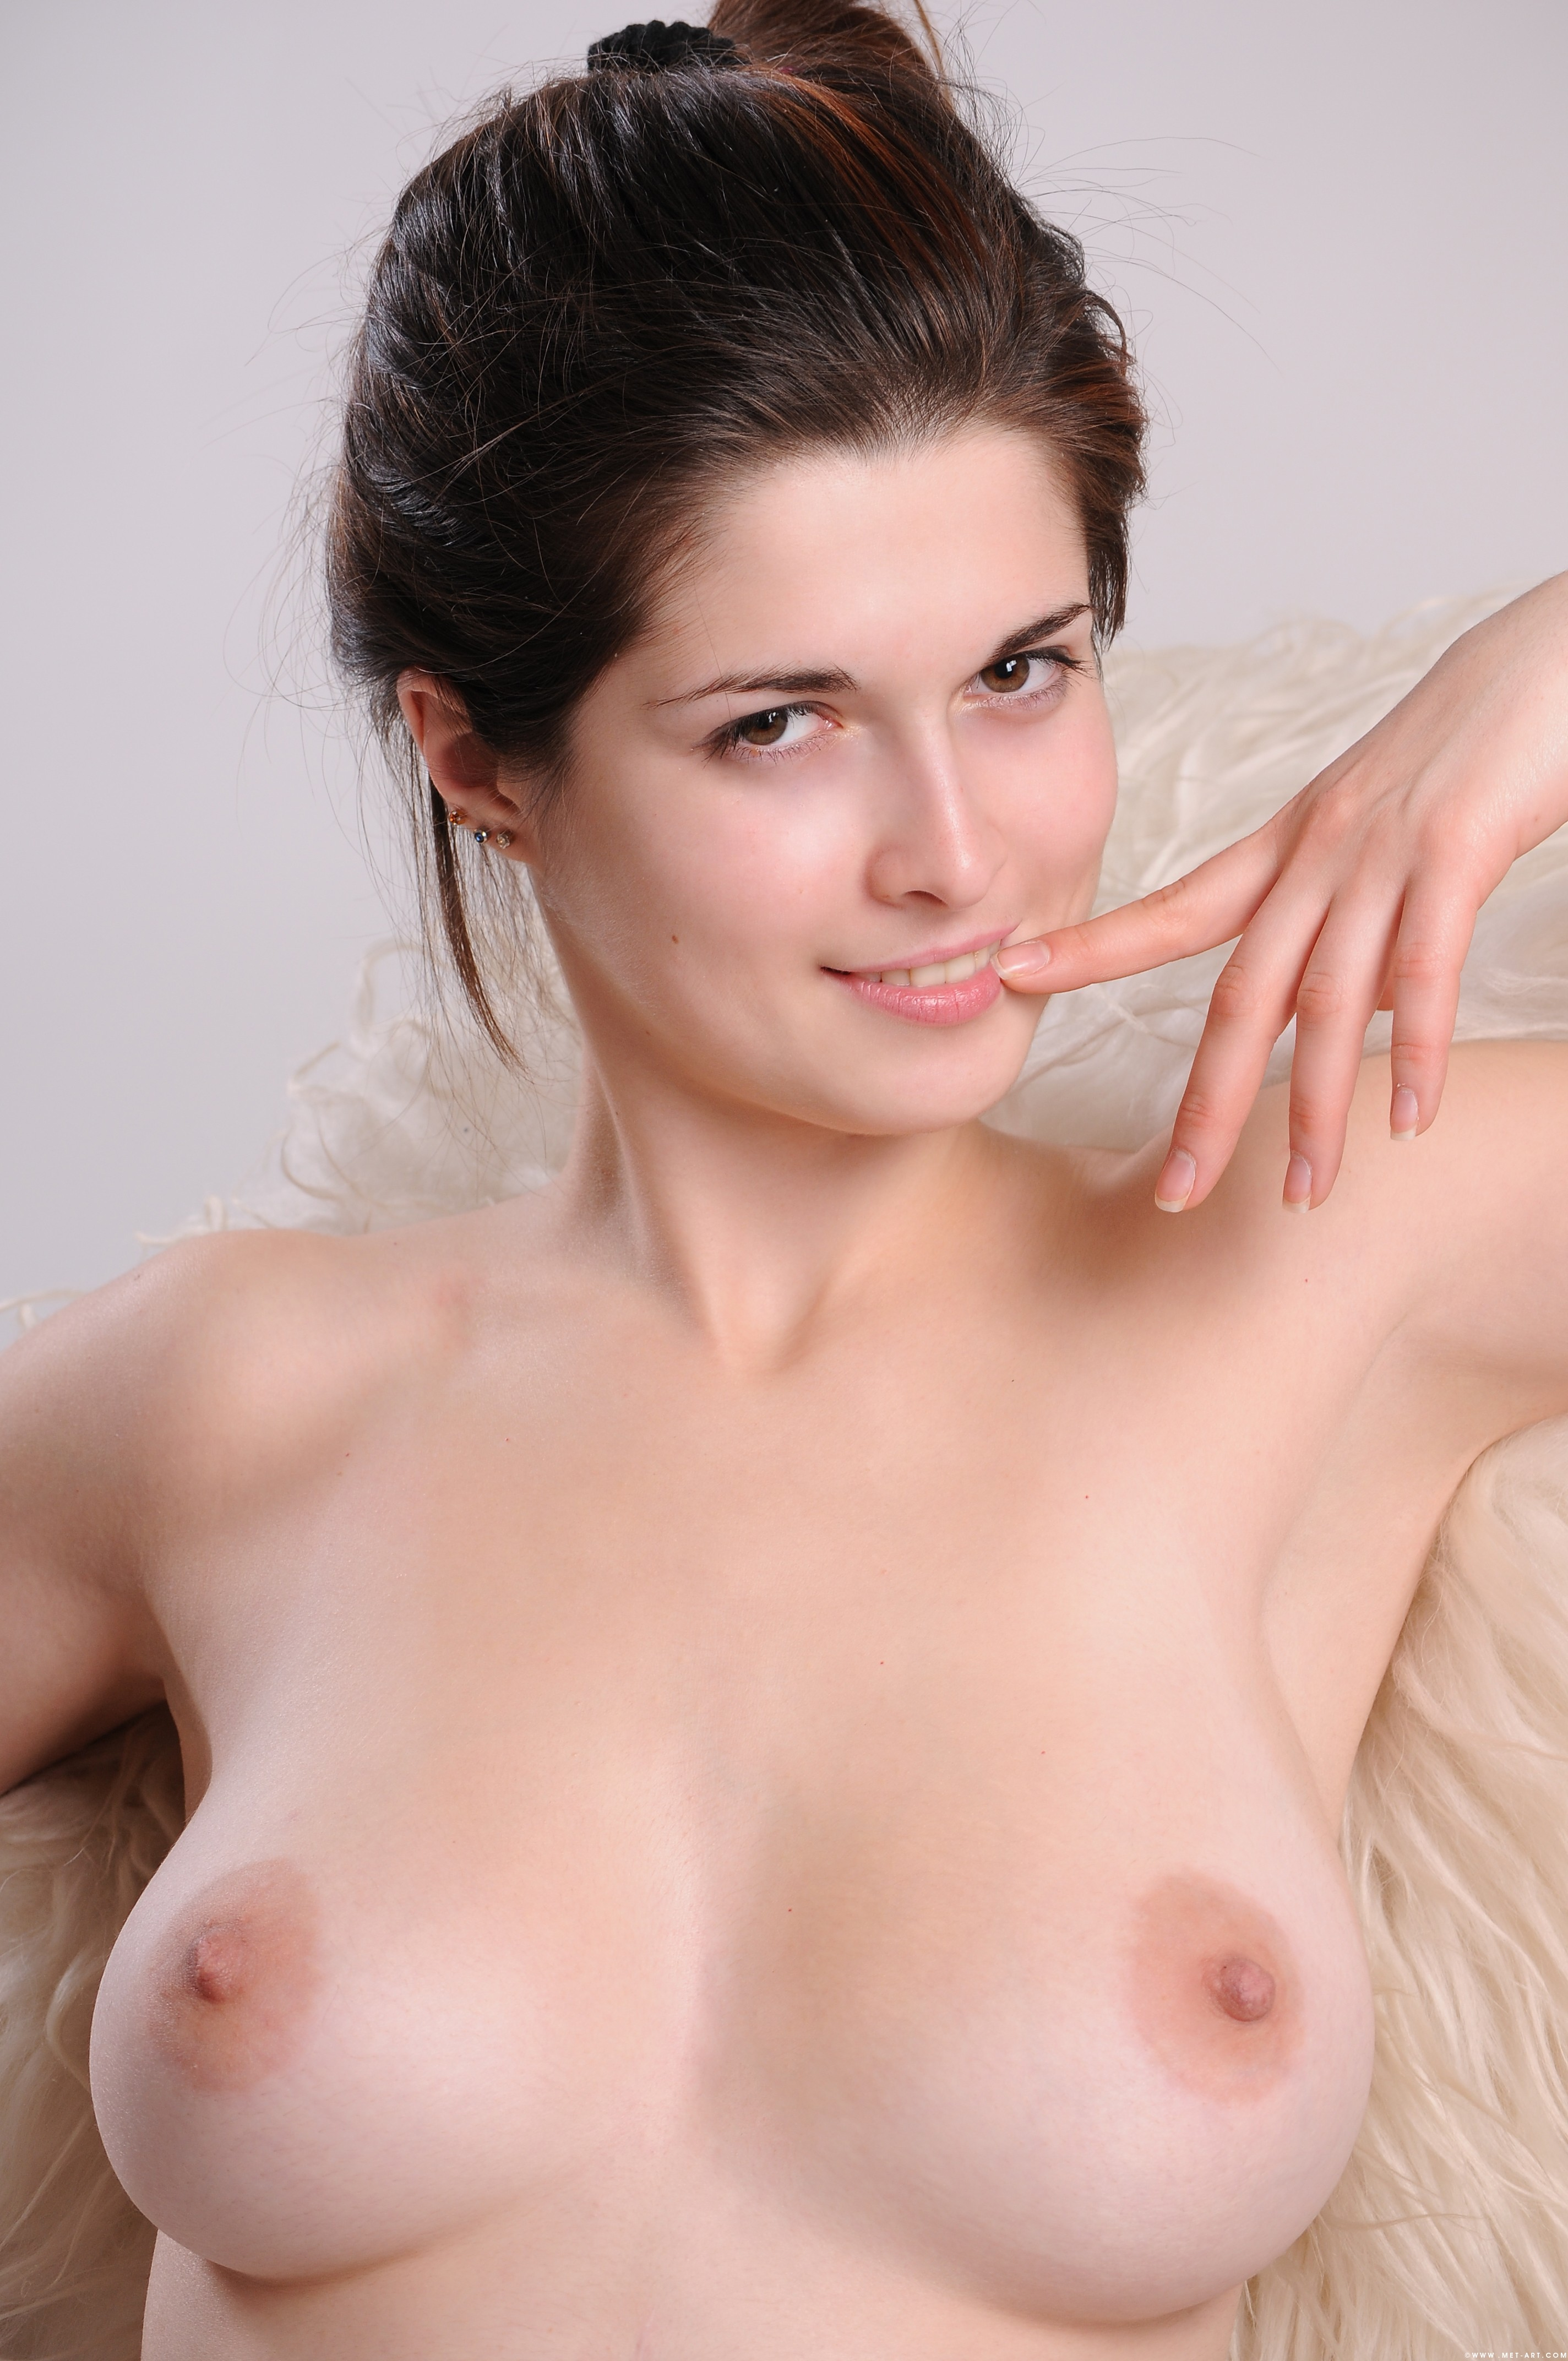 turboimagehost.com imagesize:960x144piss porn 1 MET ART KOI 1 0090